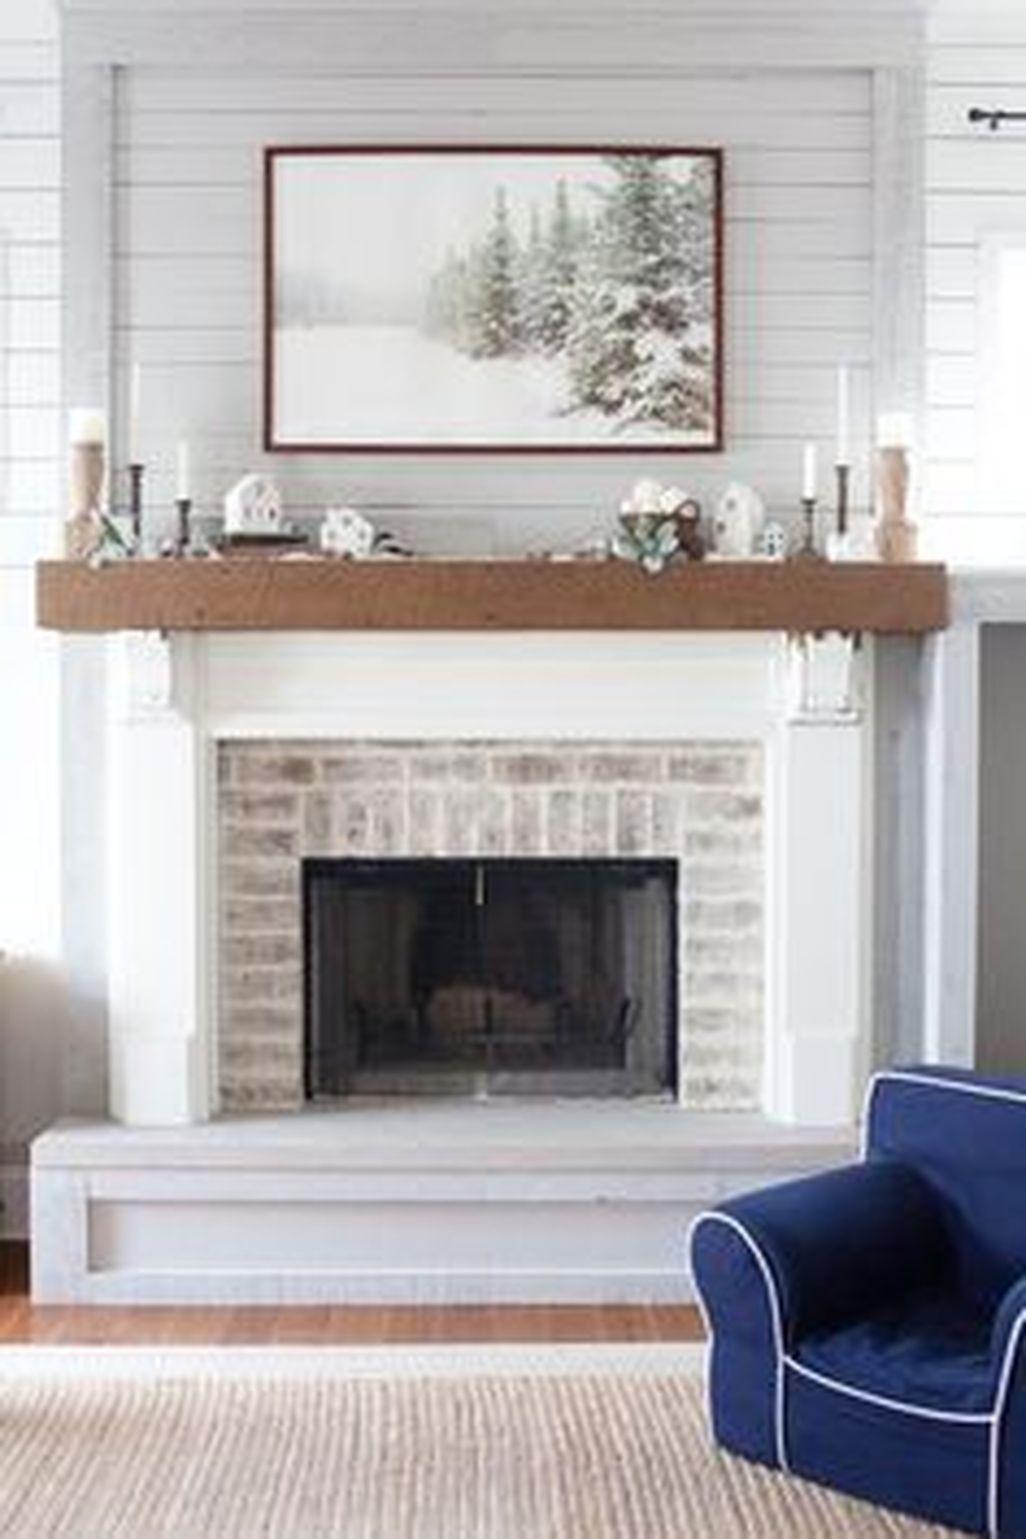 Inspiring Corner Fireplace Ideas In The Living Room 37